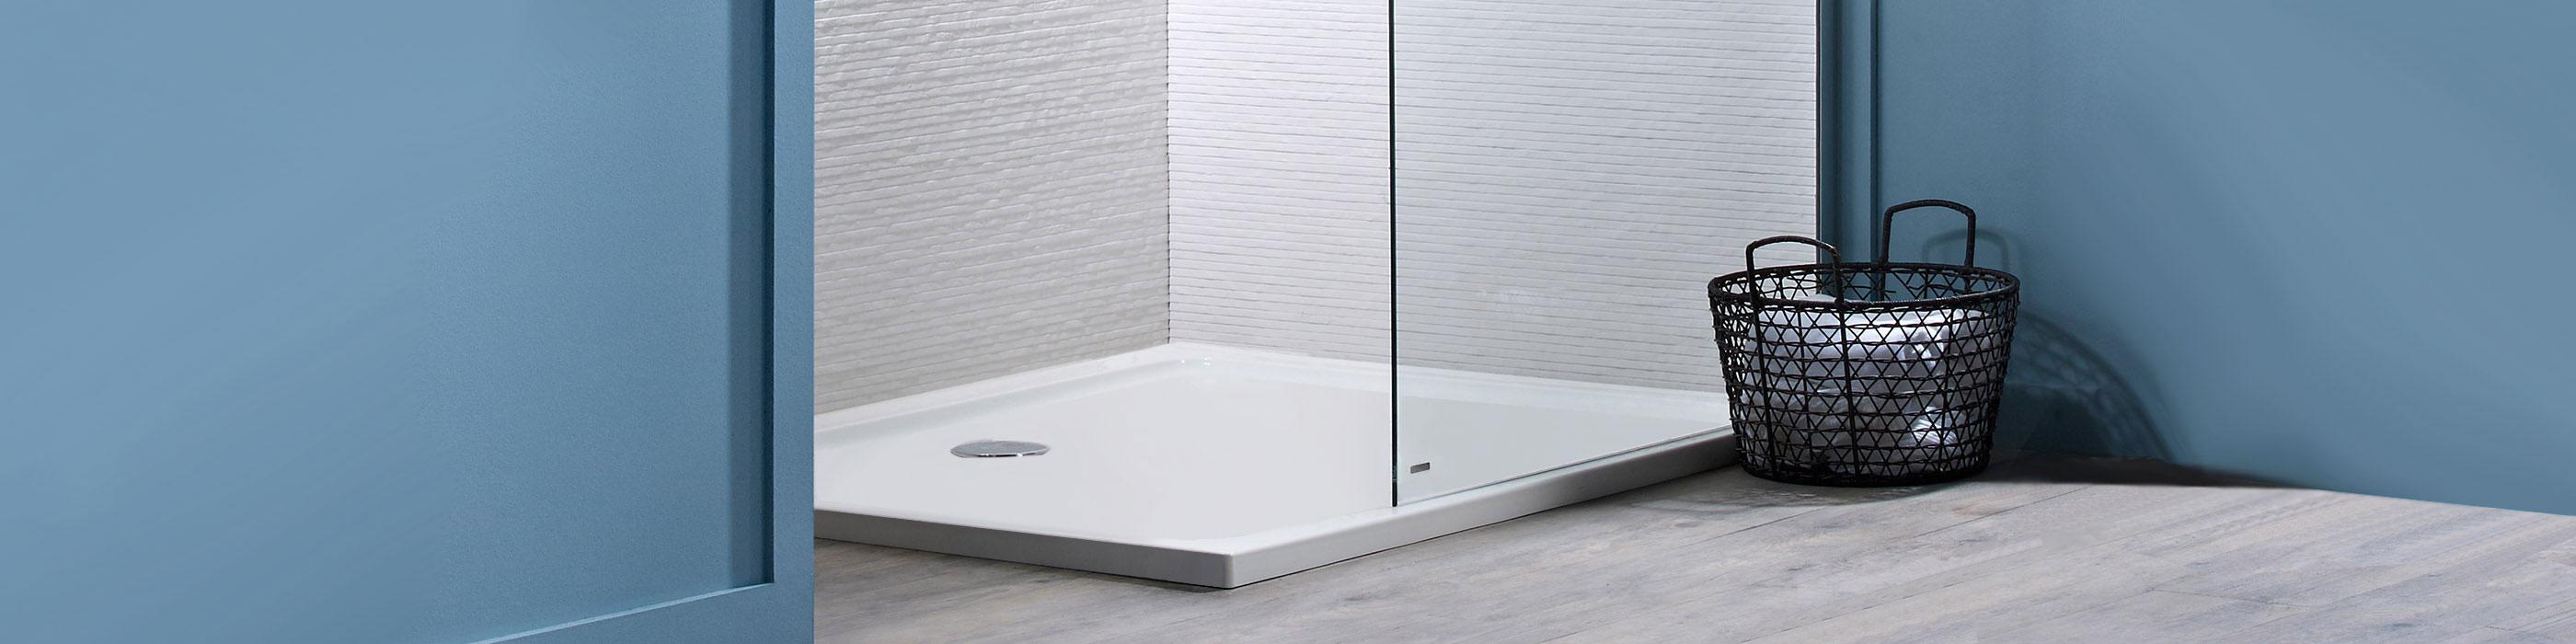 American Standard Bathroom Accessories